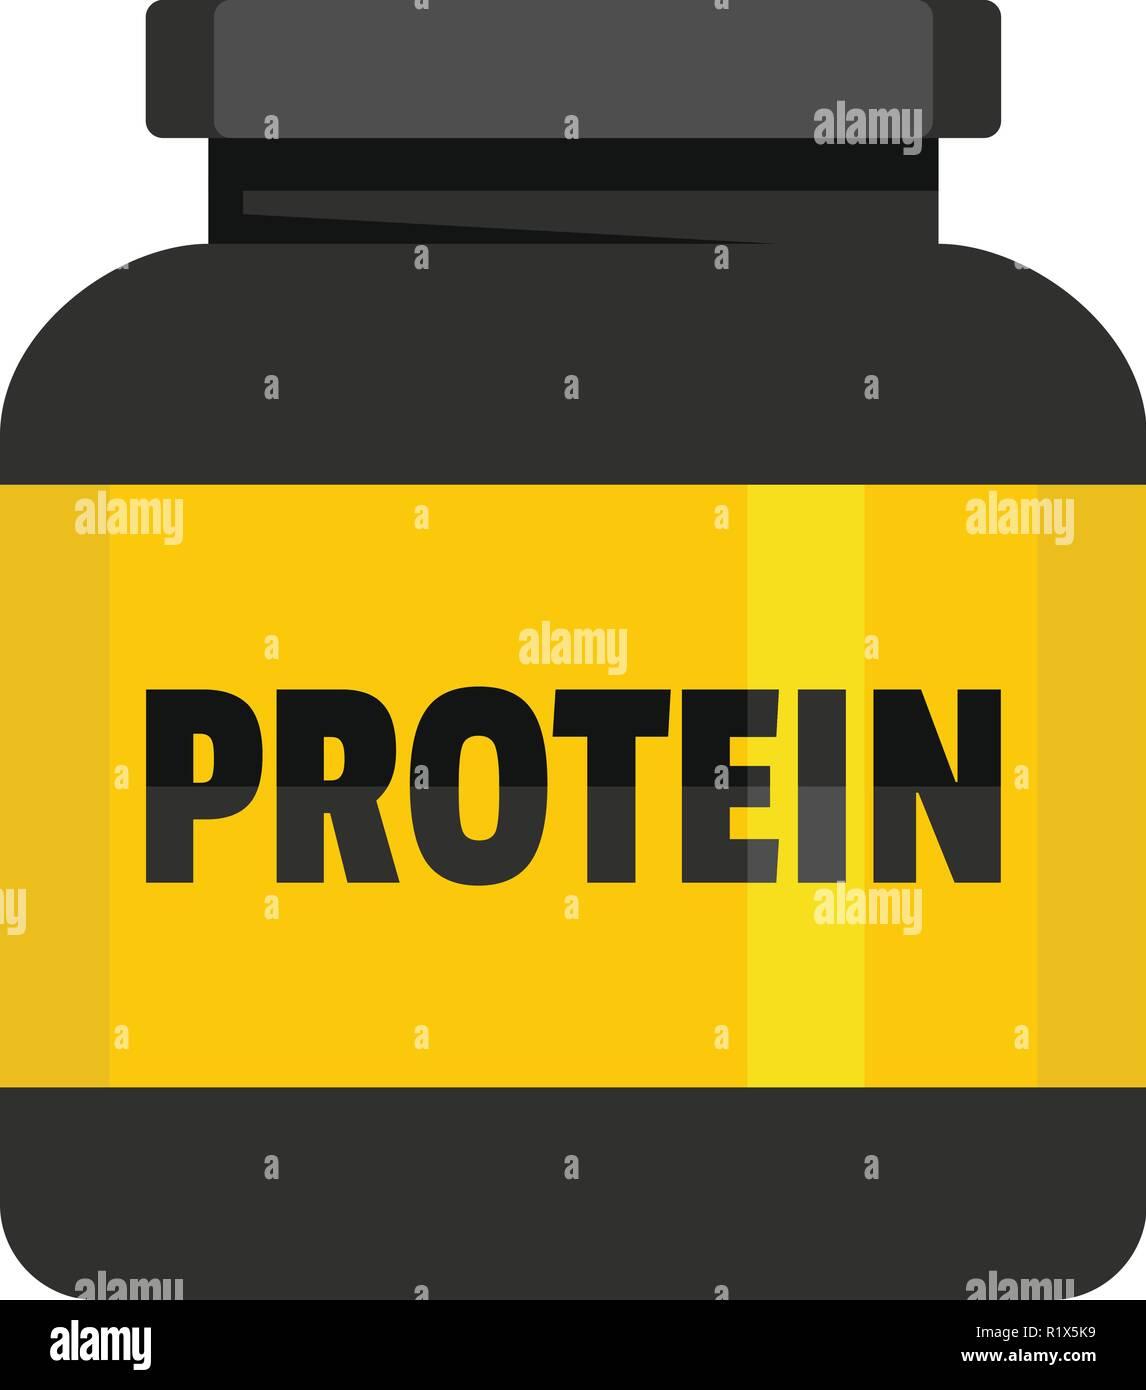 Kilogram protein icon. Flat illustration of kilogram protein vector icon for web. - Stock Image